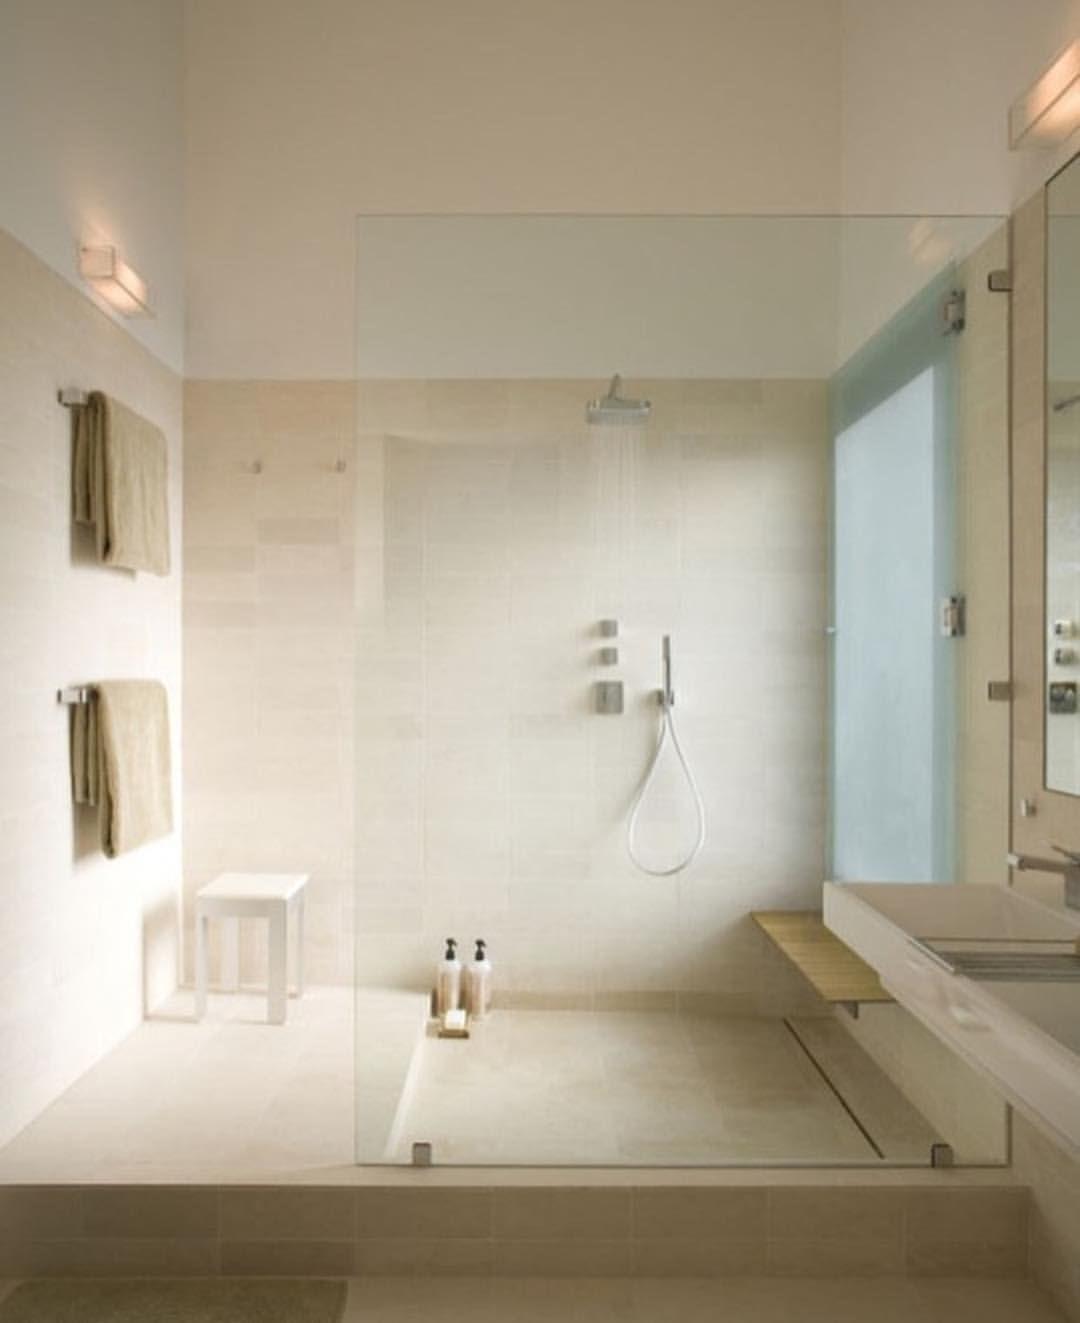 pin by nicole schlomann on home inspo bathroom modern bathroom rh pinterest com